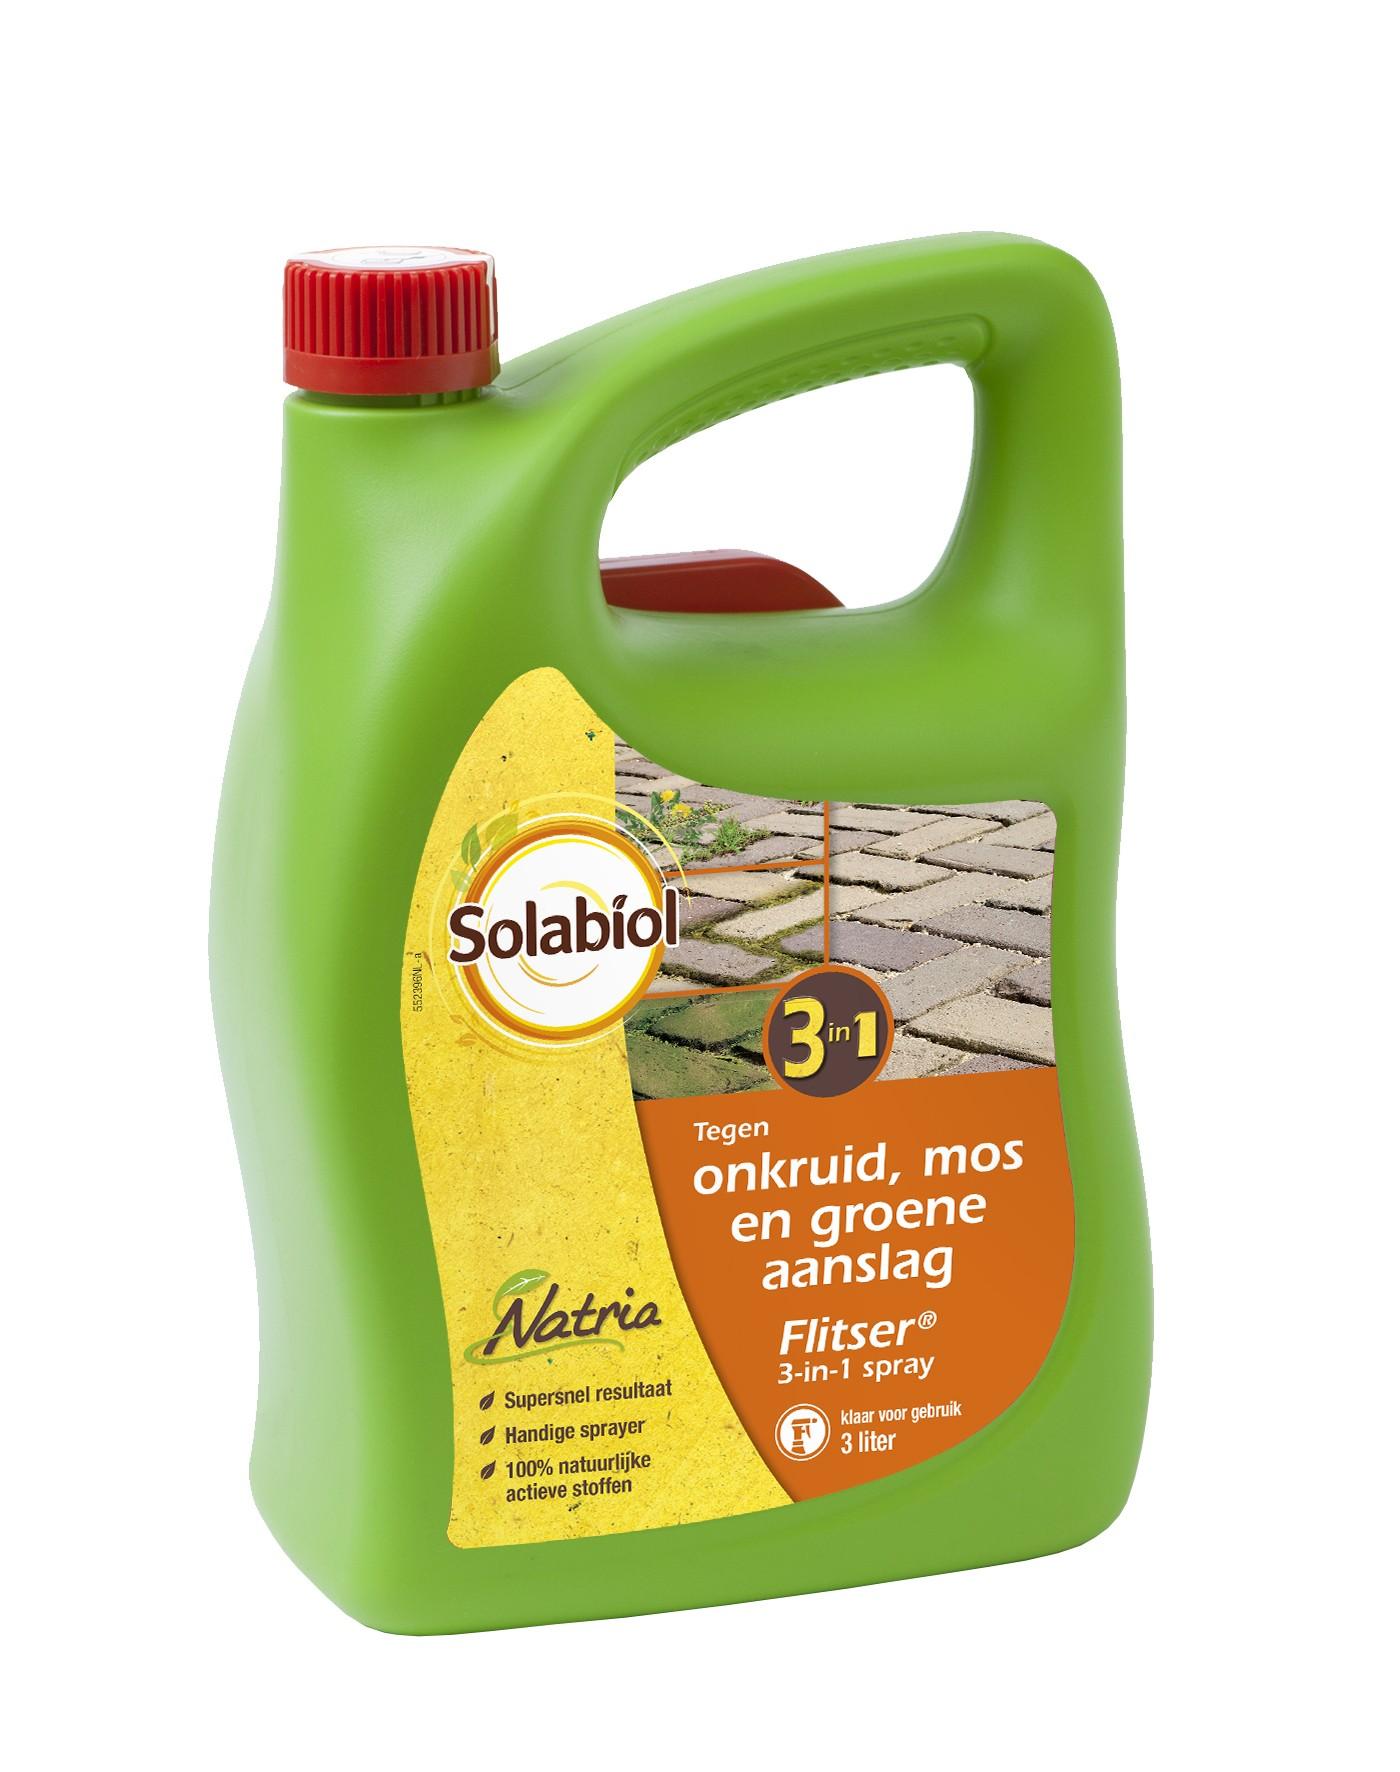 Flitser 3-in-1 spray 3L